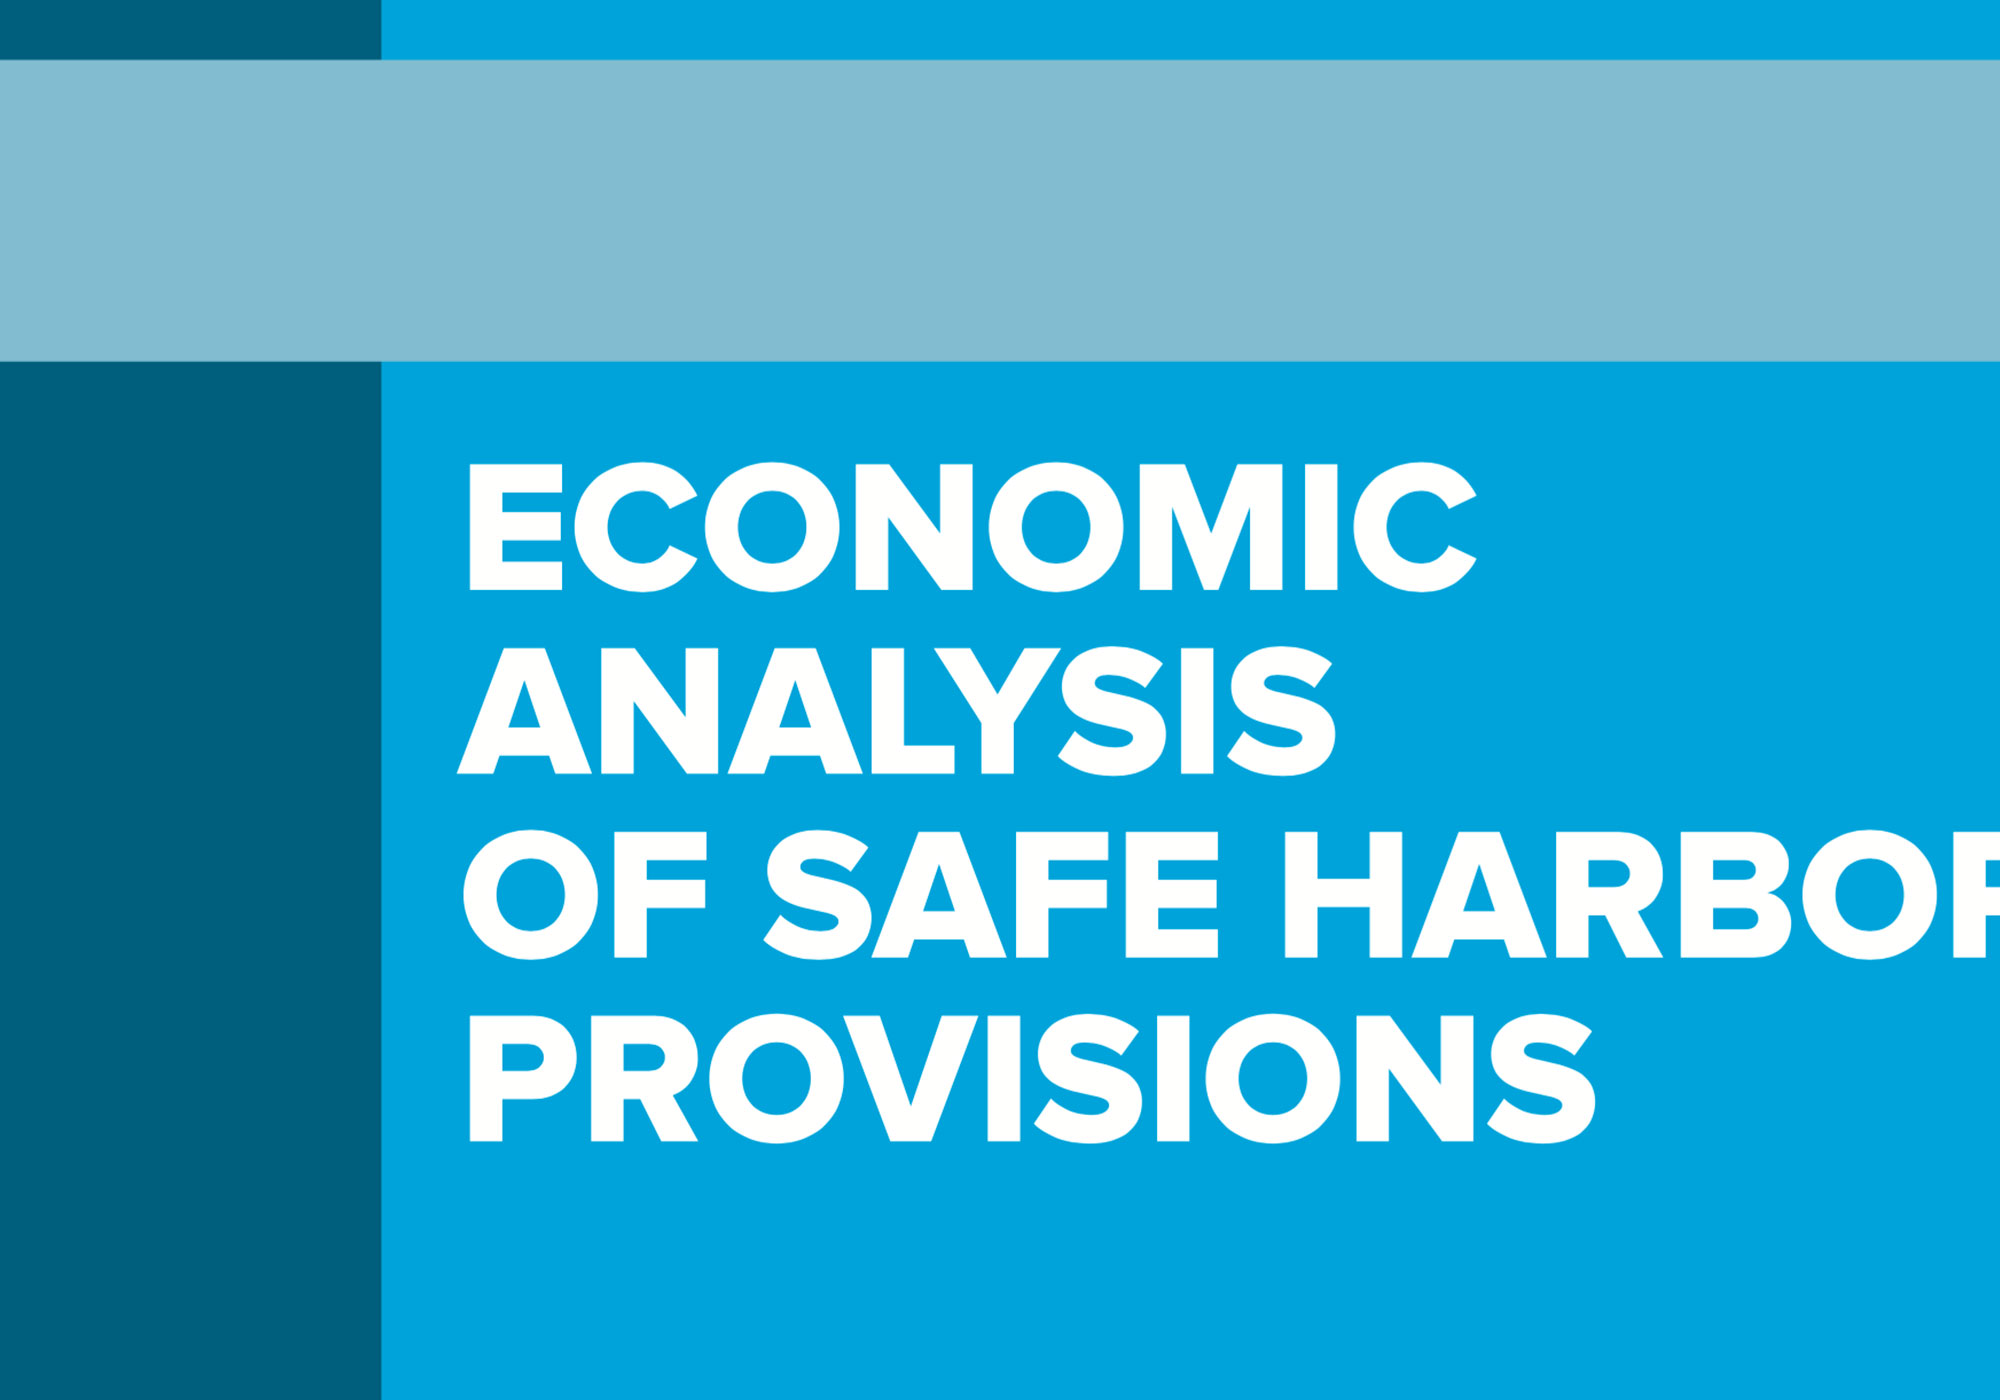 Fairness Rocks News ECONOMIC ANALYSIS OF SAFE HARBOR PROVISIONS